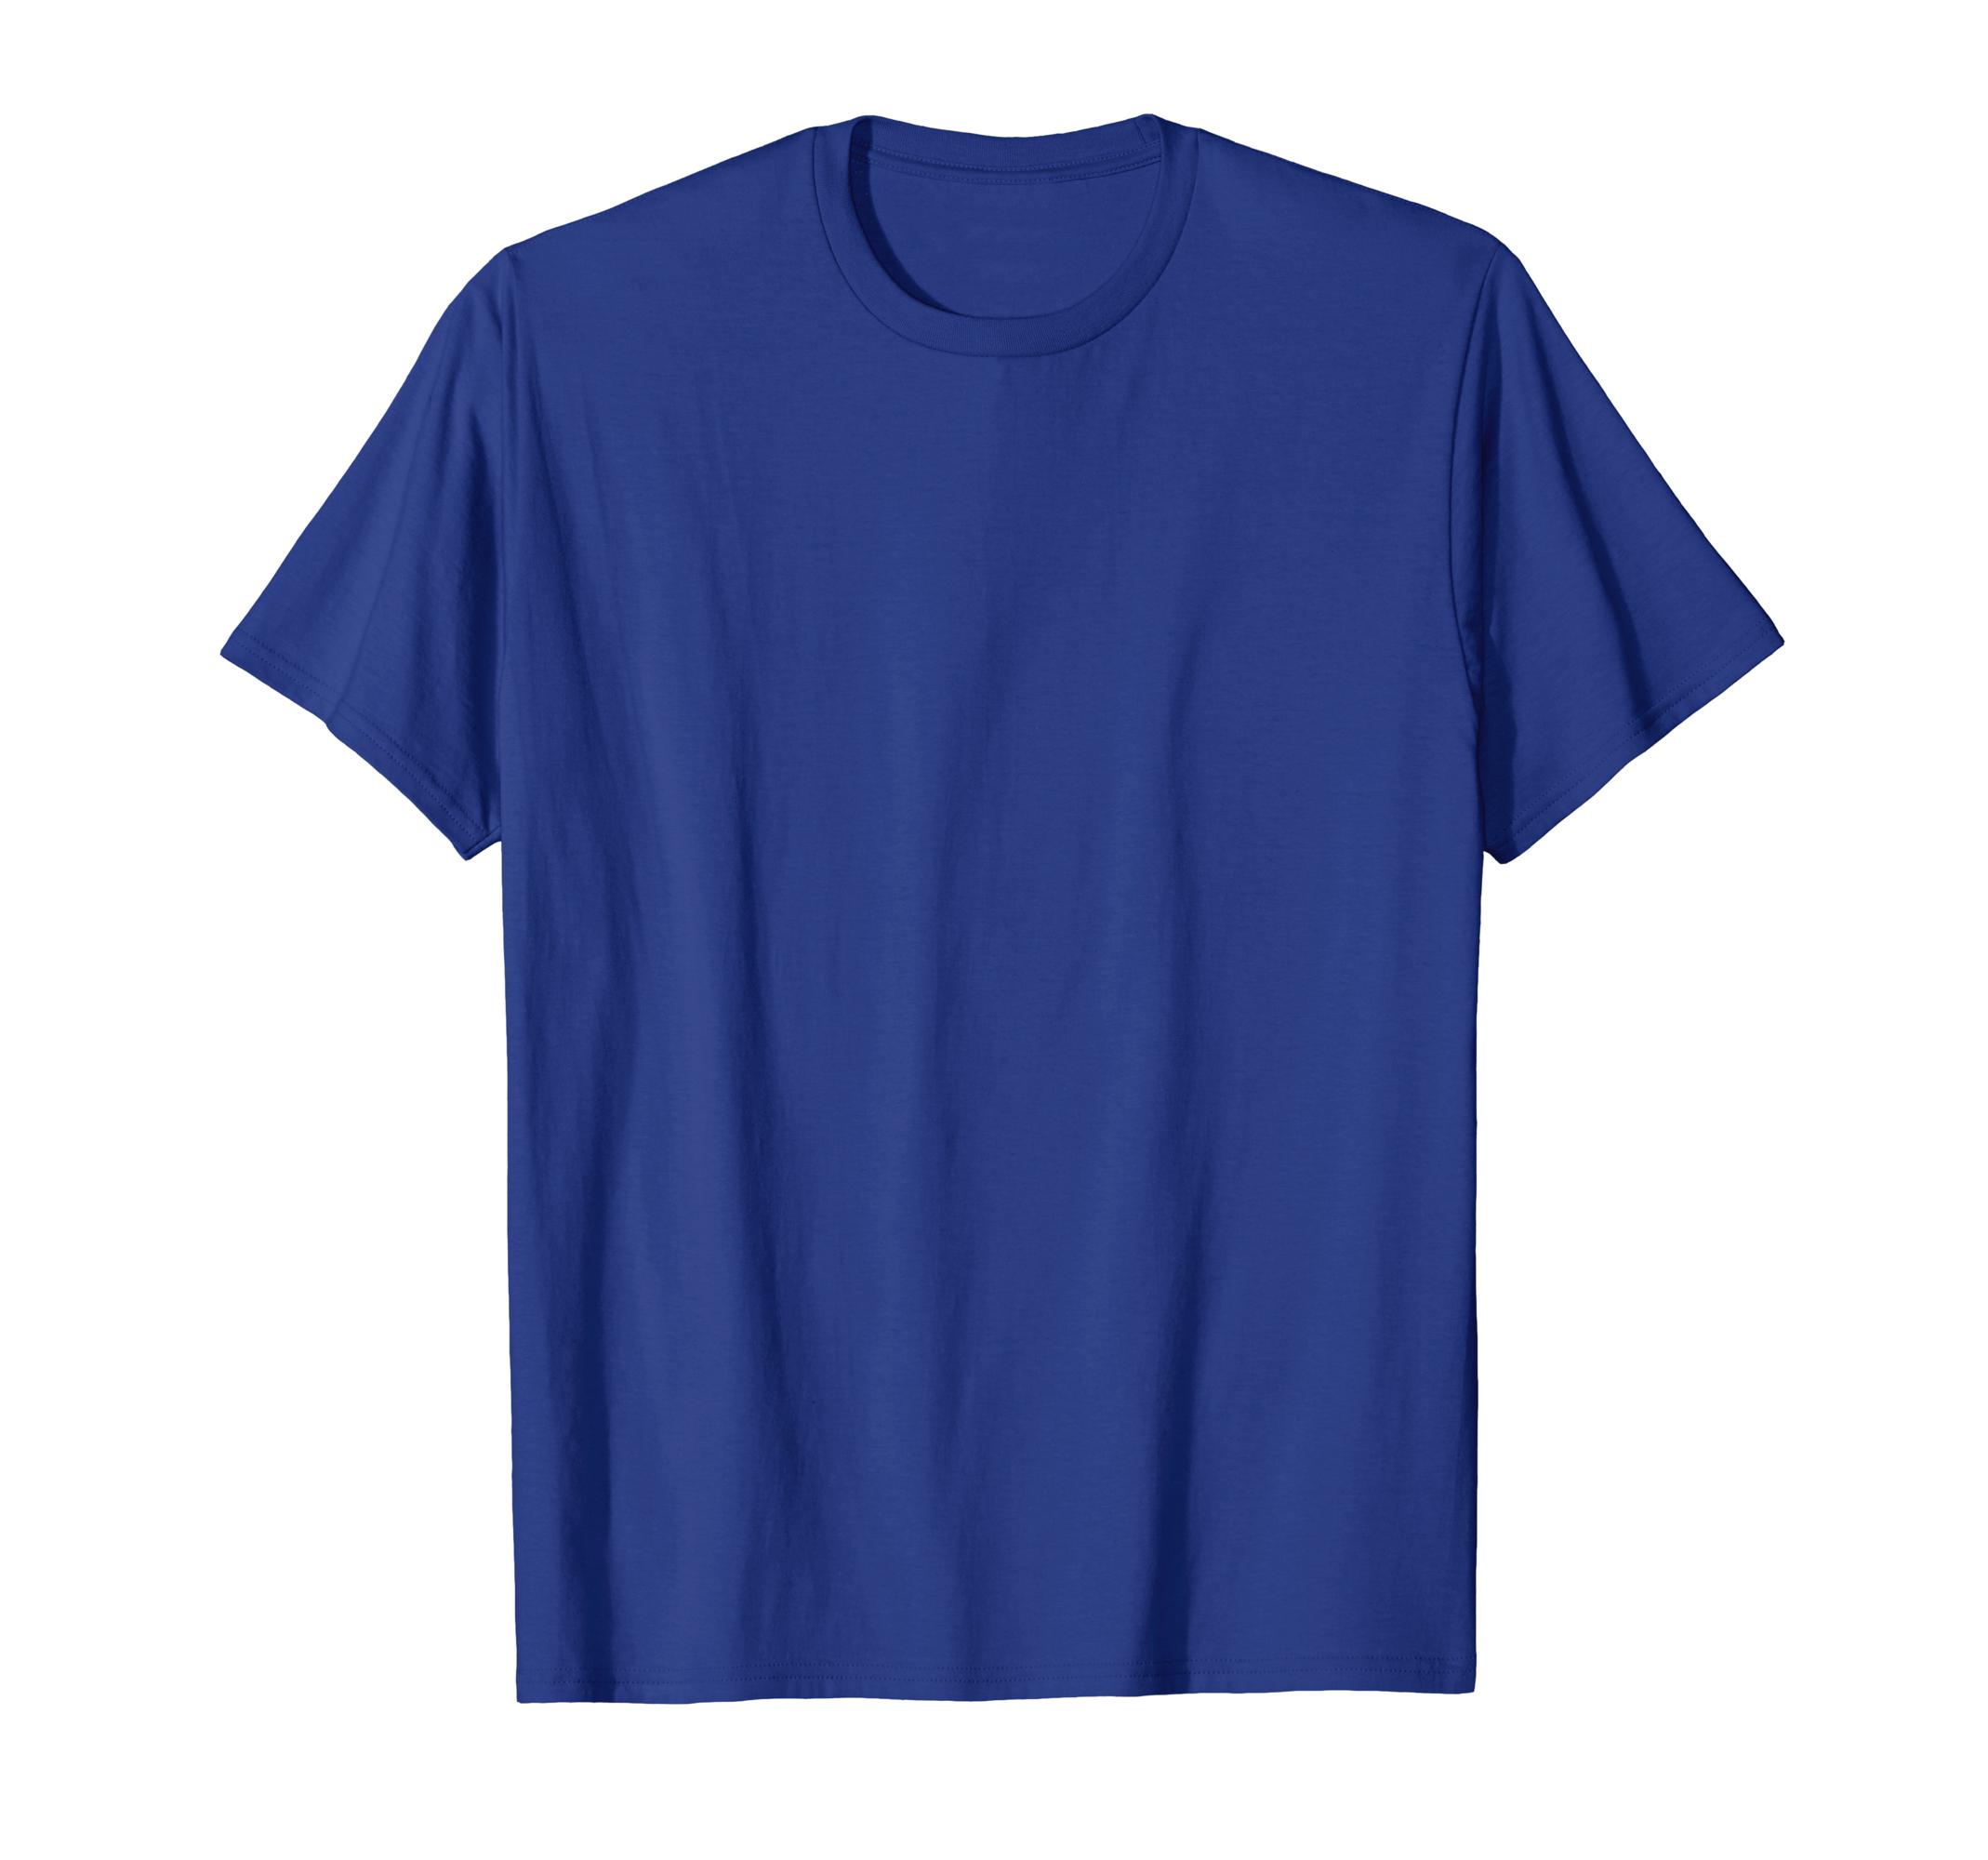 X-Men T-Shirt Marvel Comics Comic T-Shirt blau Original LOGOSHIRT